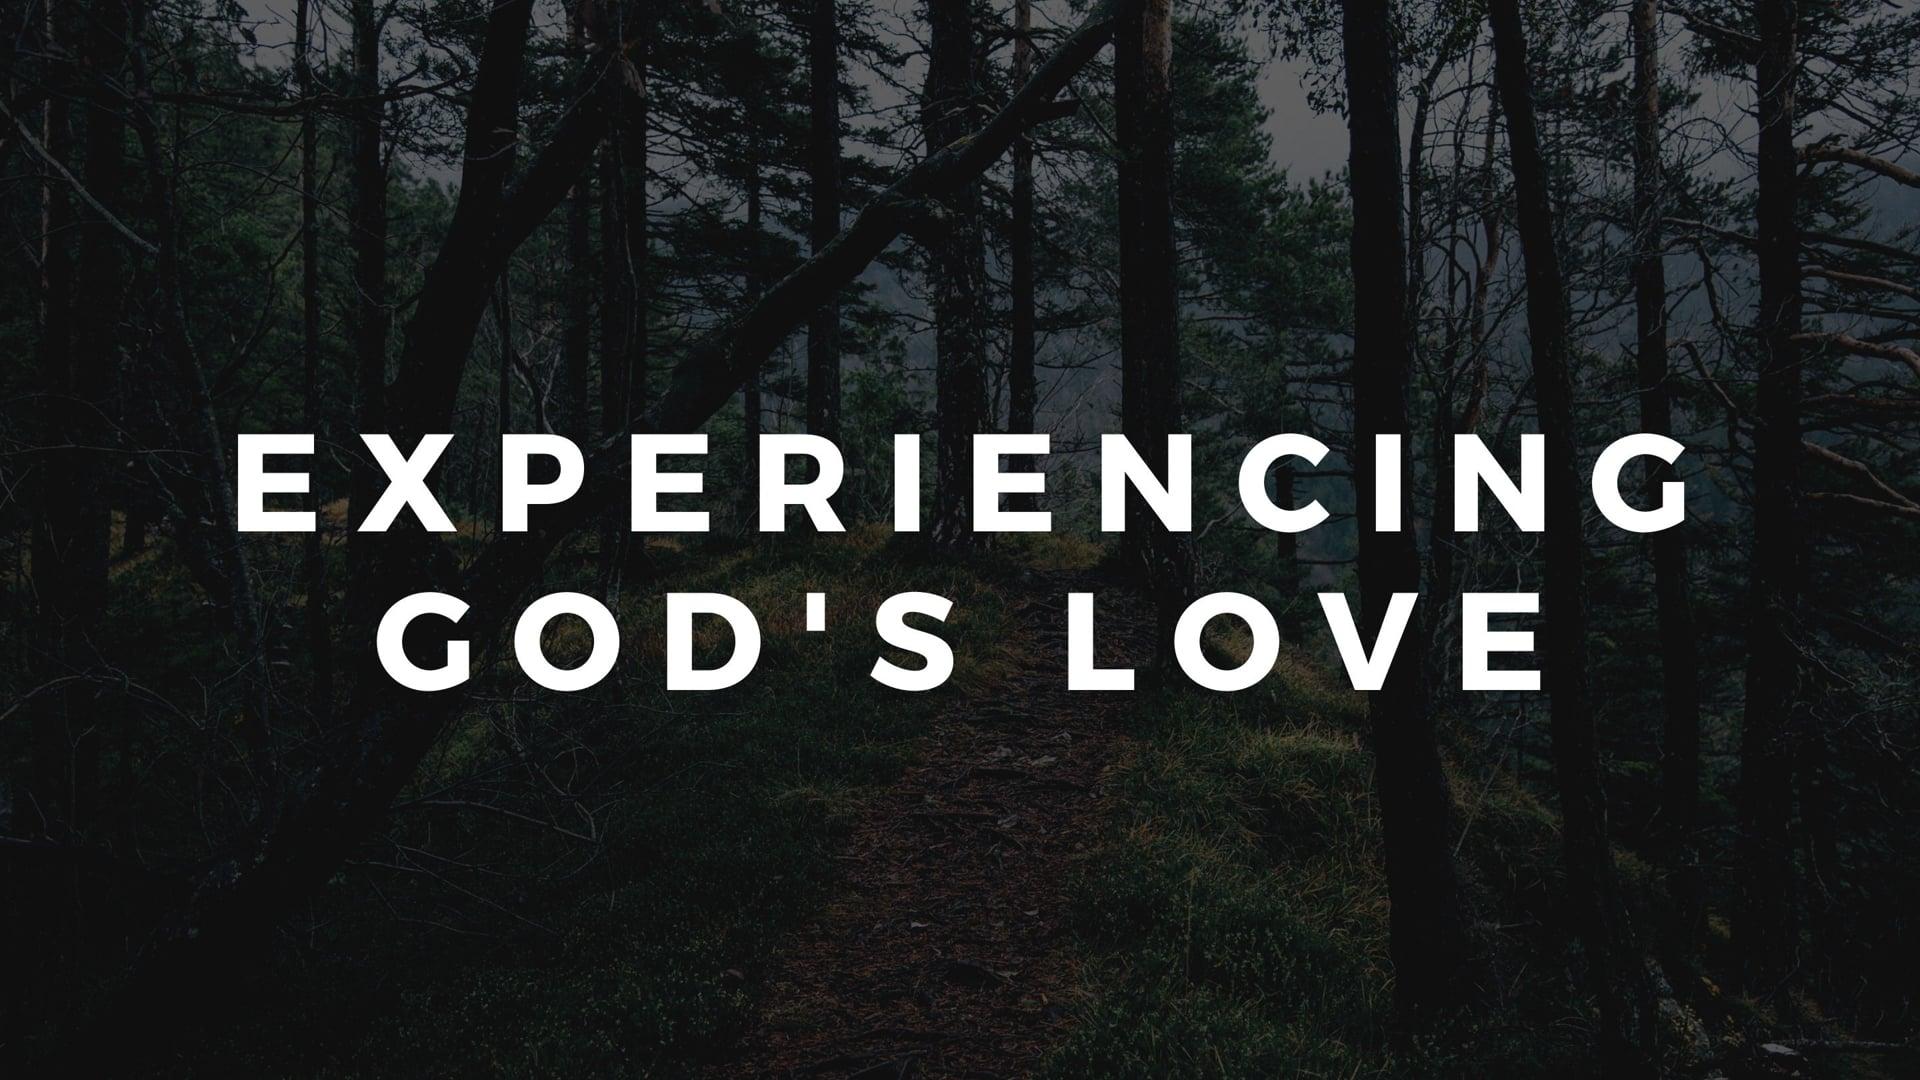 Experience God's Love - November 8, 2020